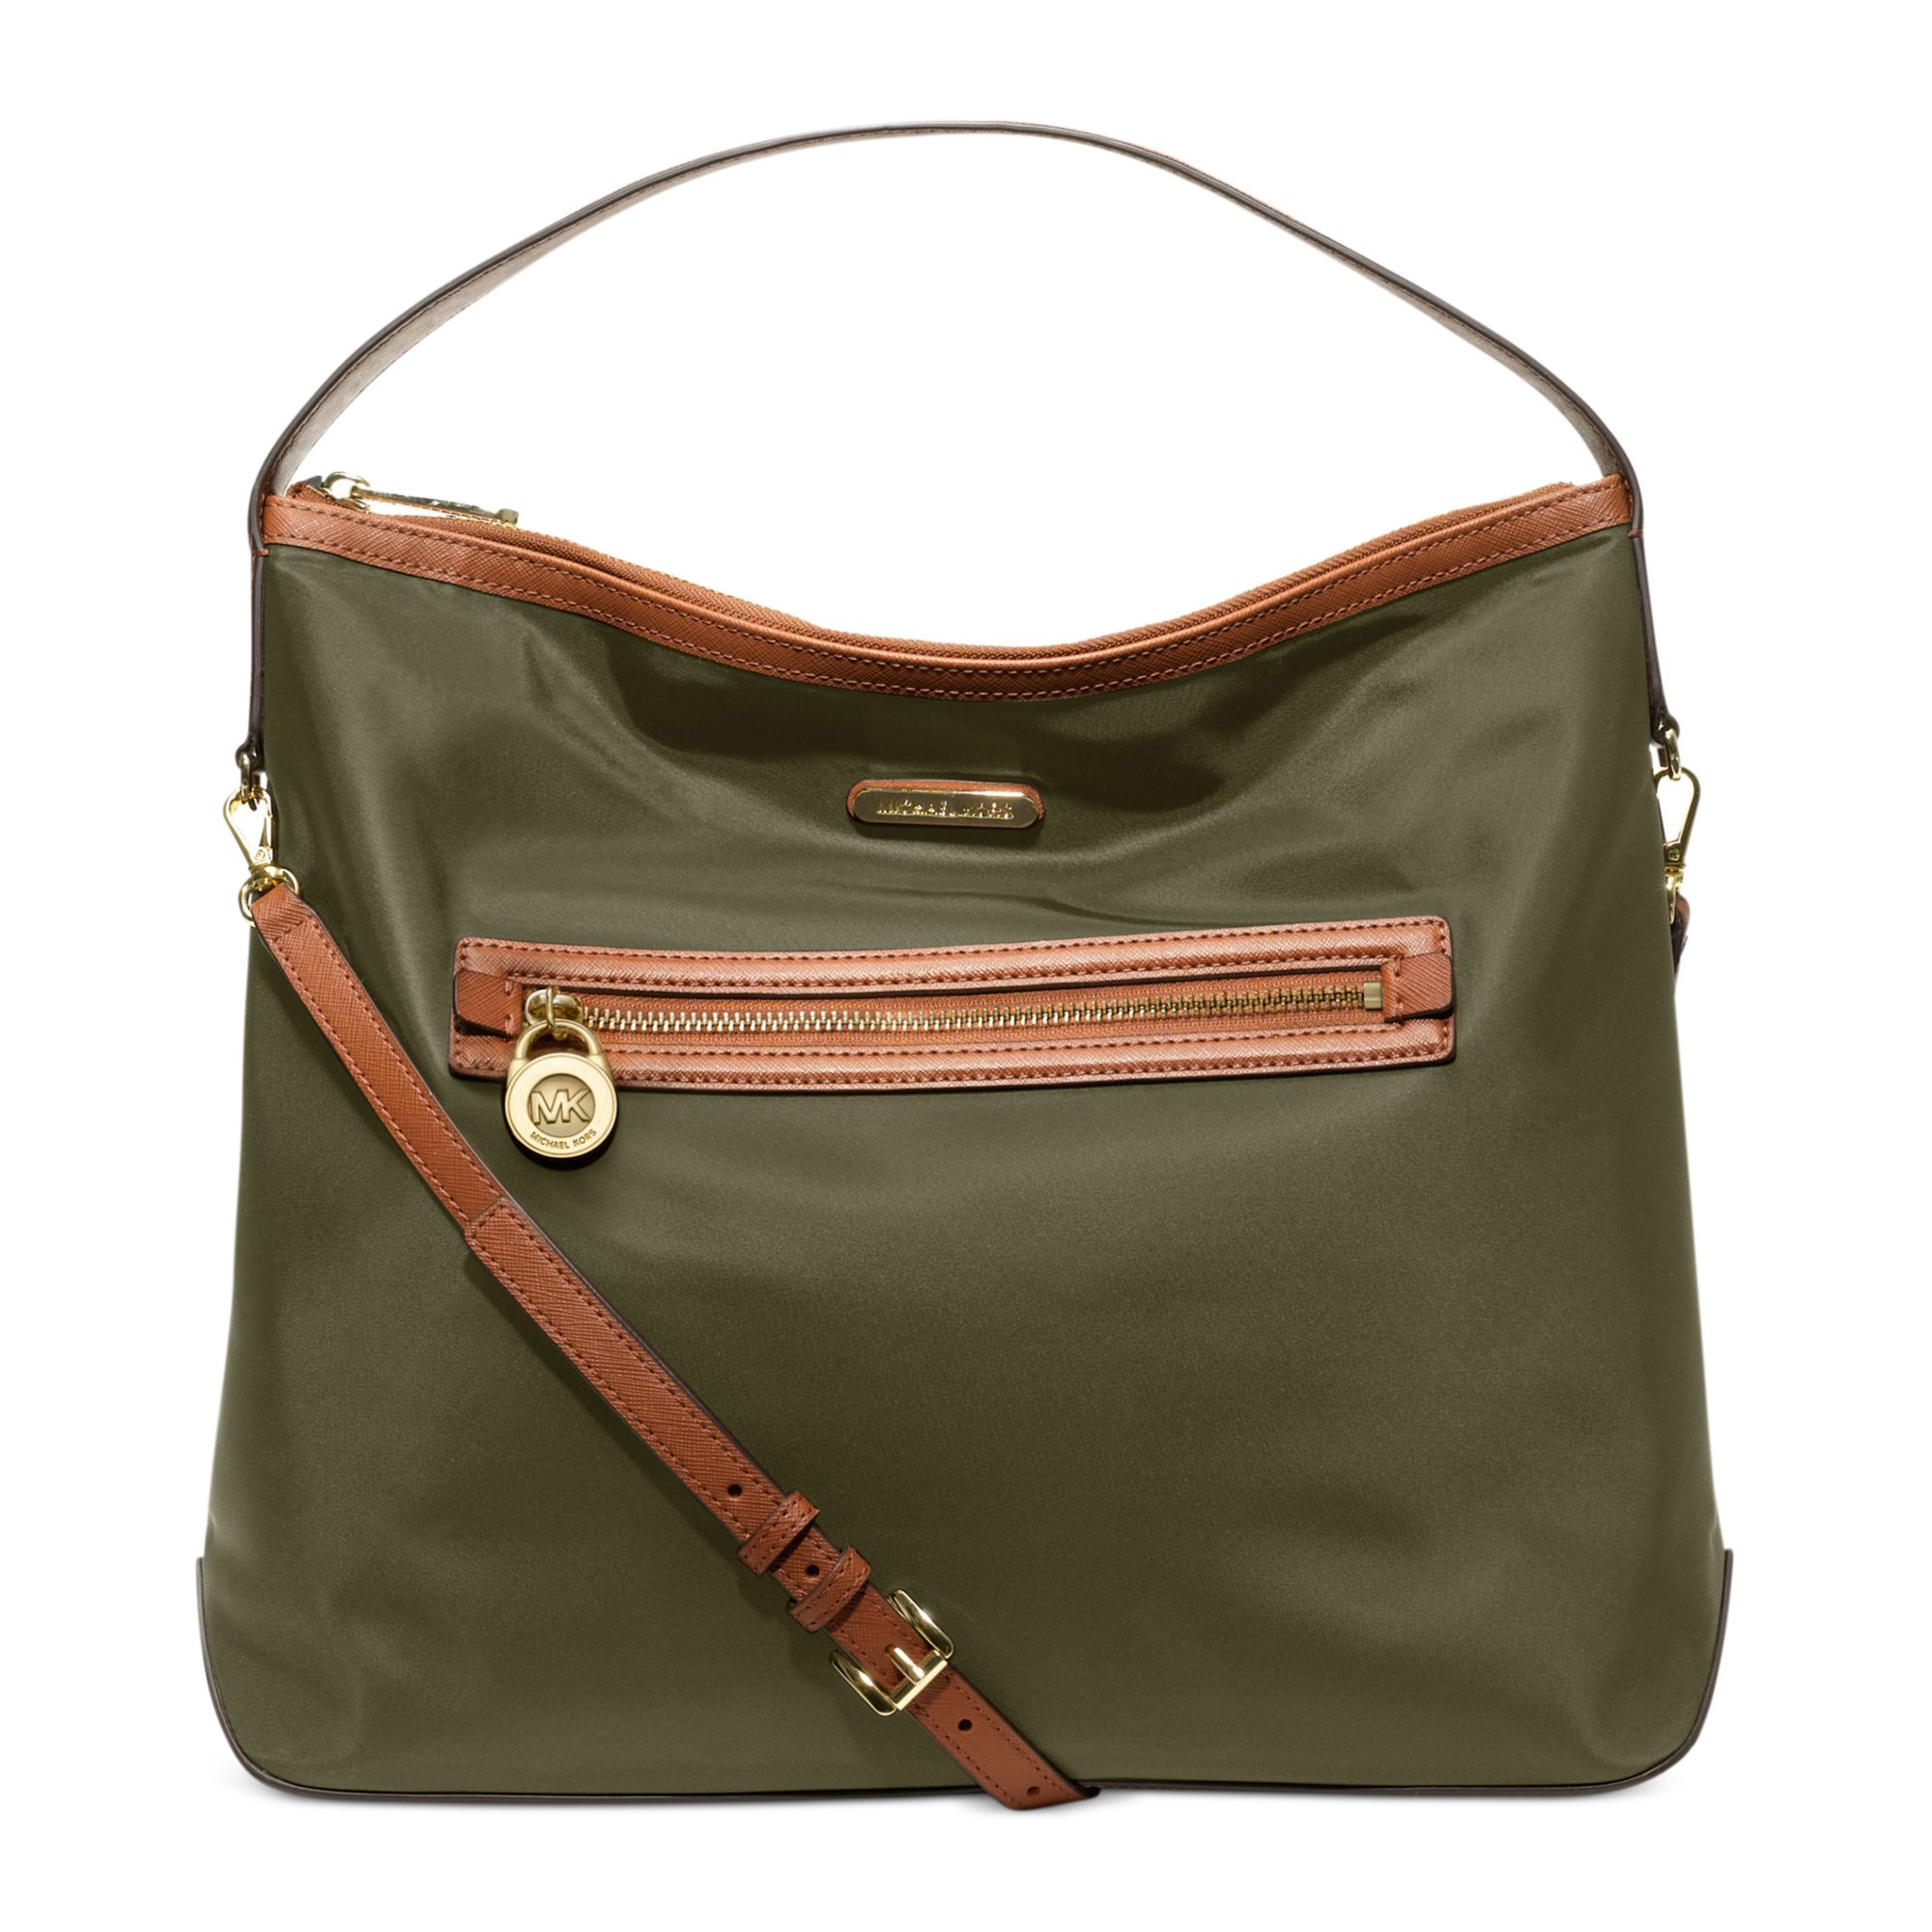 30876de39d6526 Lyst - Michael Kors Kempton Large Shoulder Bag in Green